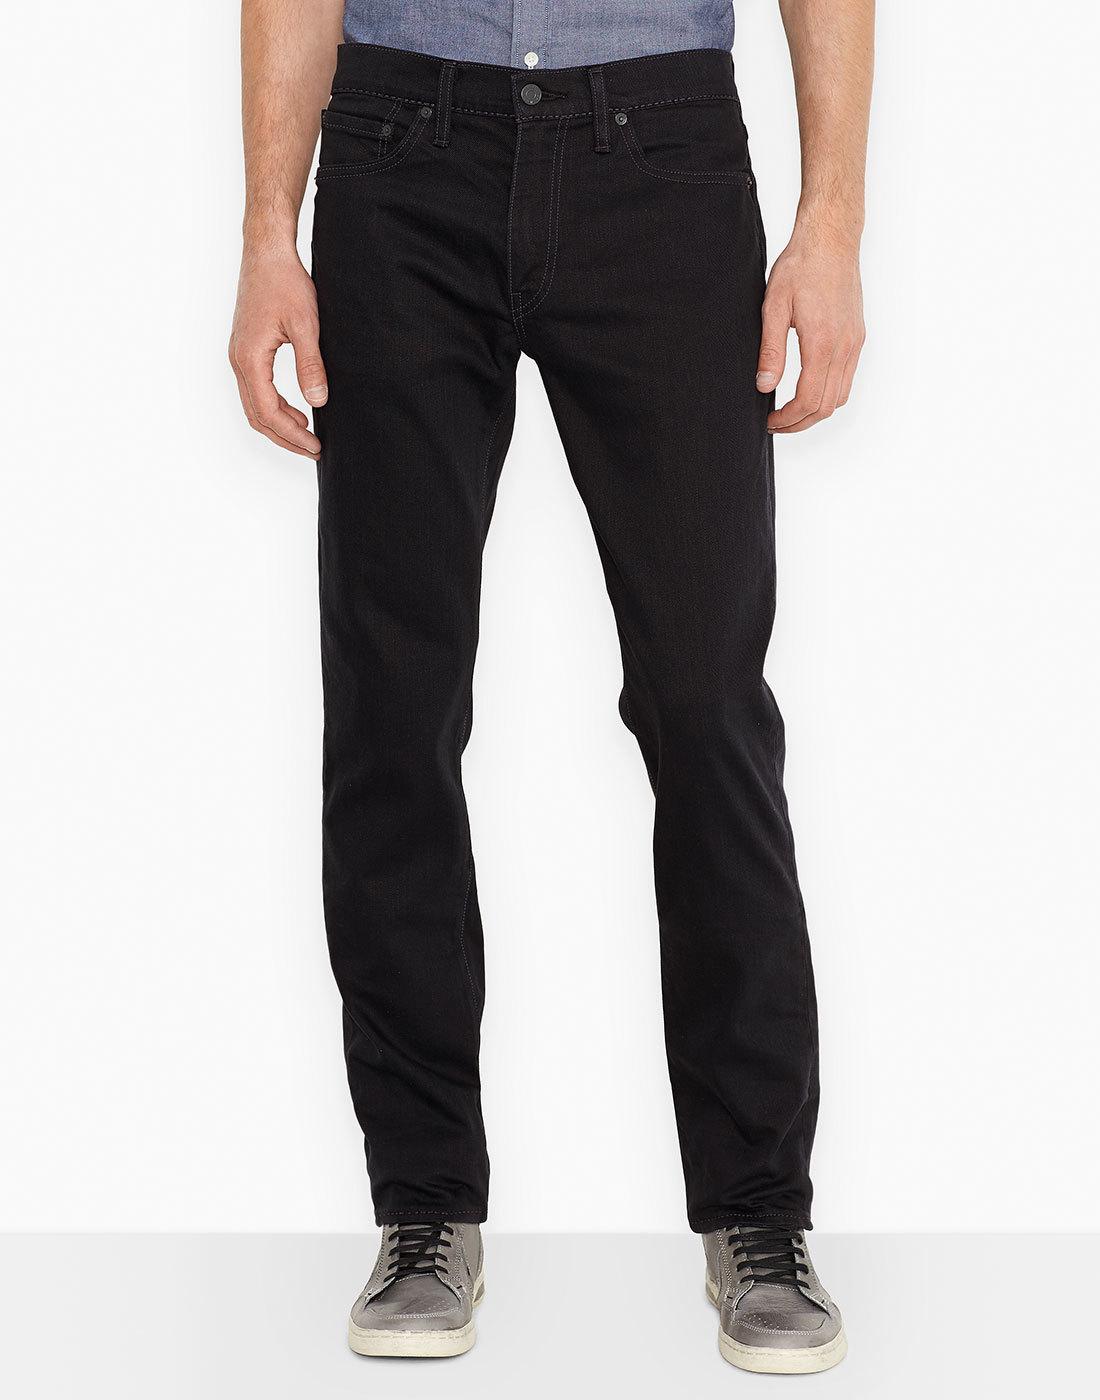 LEVI'S® 511 Retro Mod Slim Denim Jeans - Moonshine